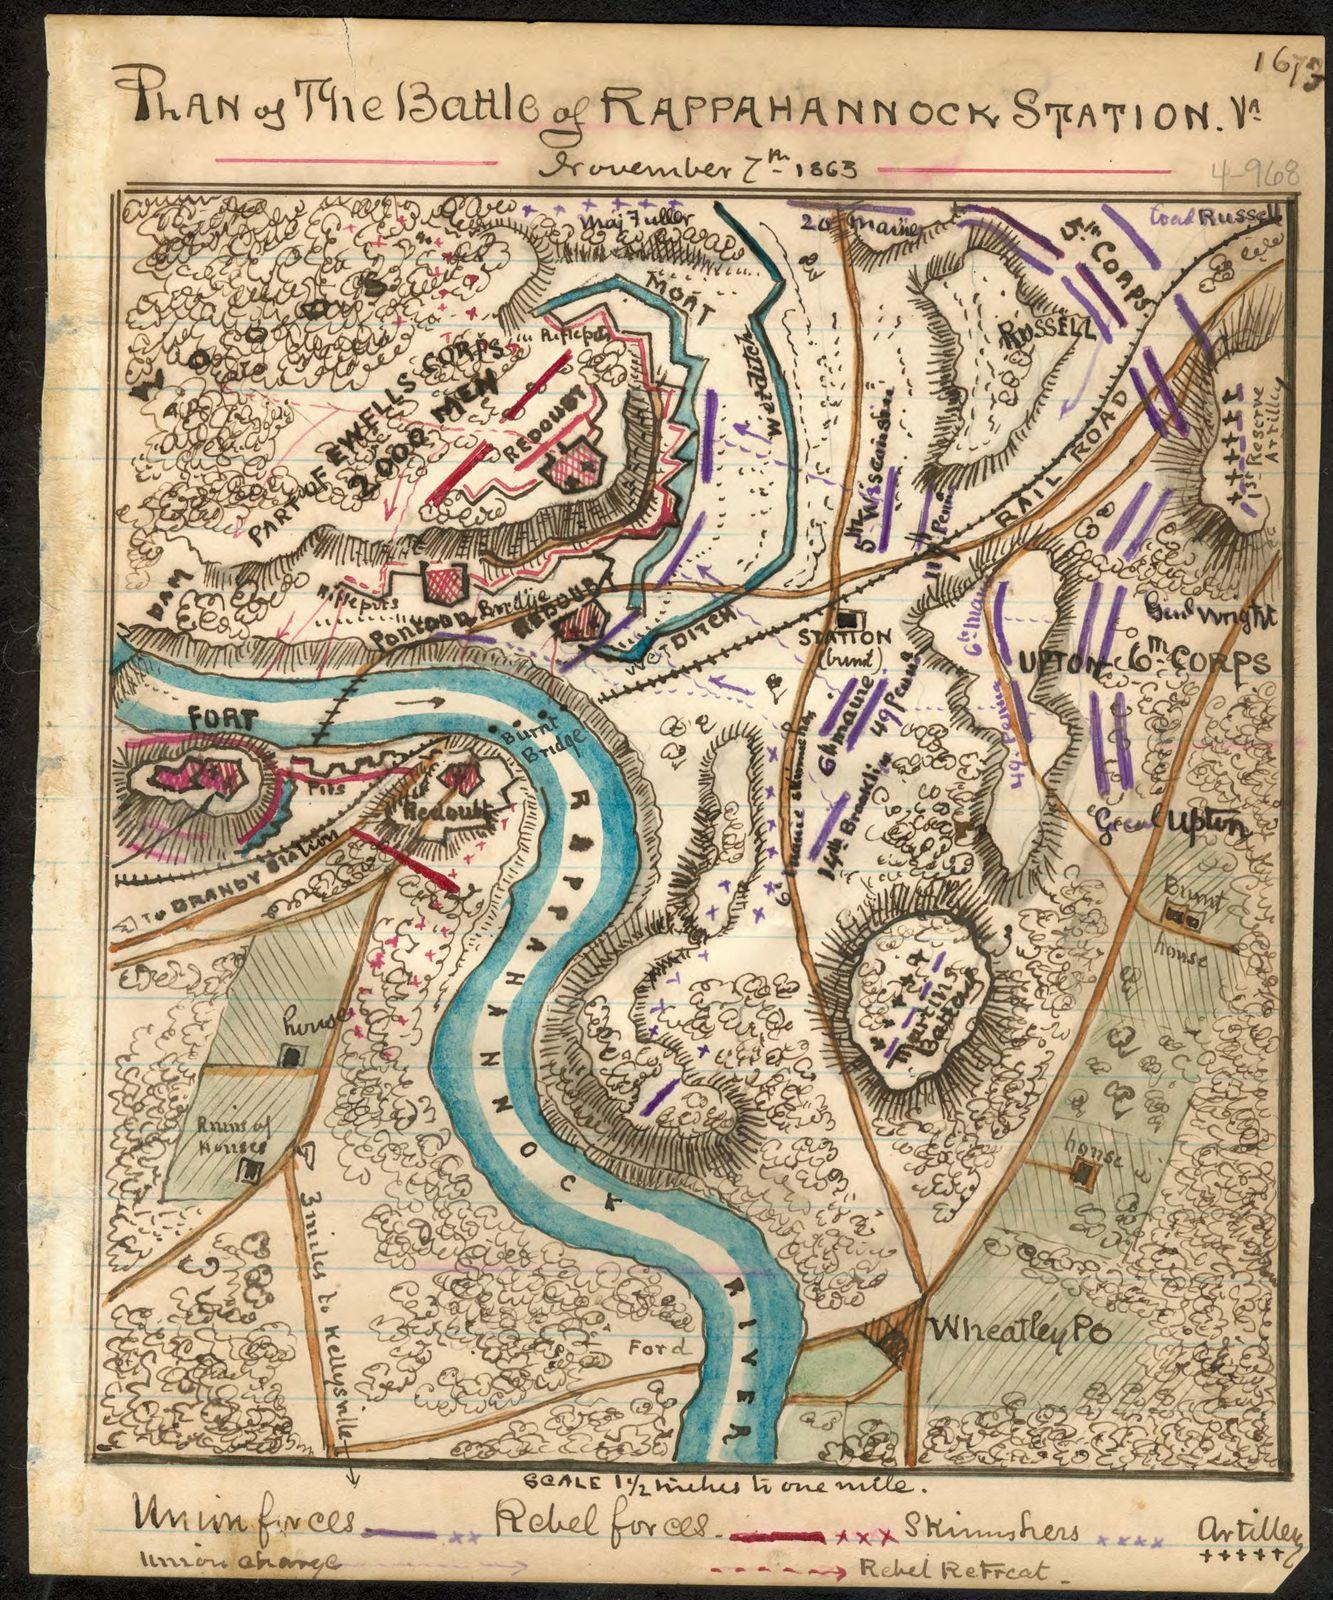 Plan of the Battle of Rappahannock Station November 7th 1863.